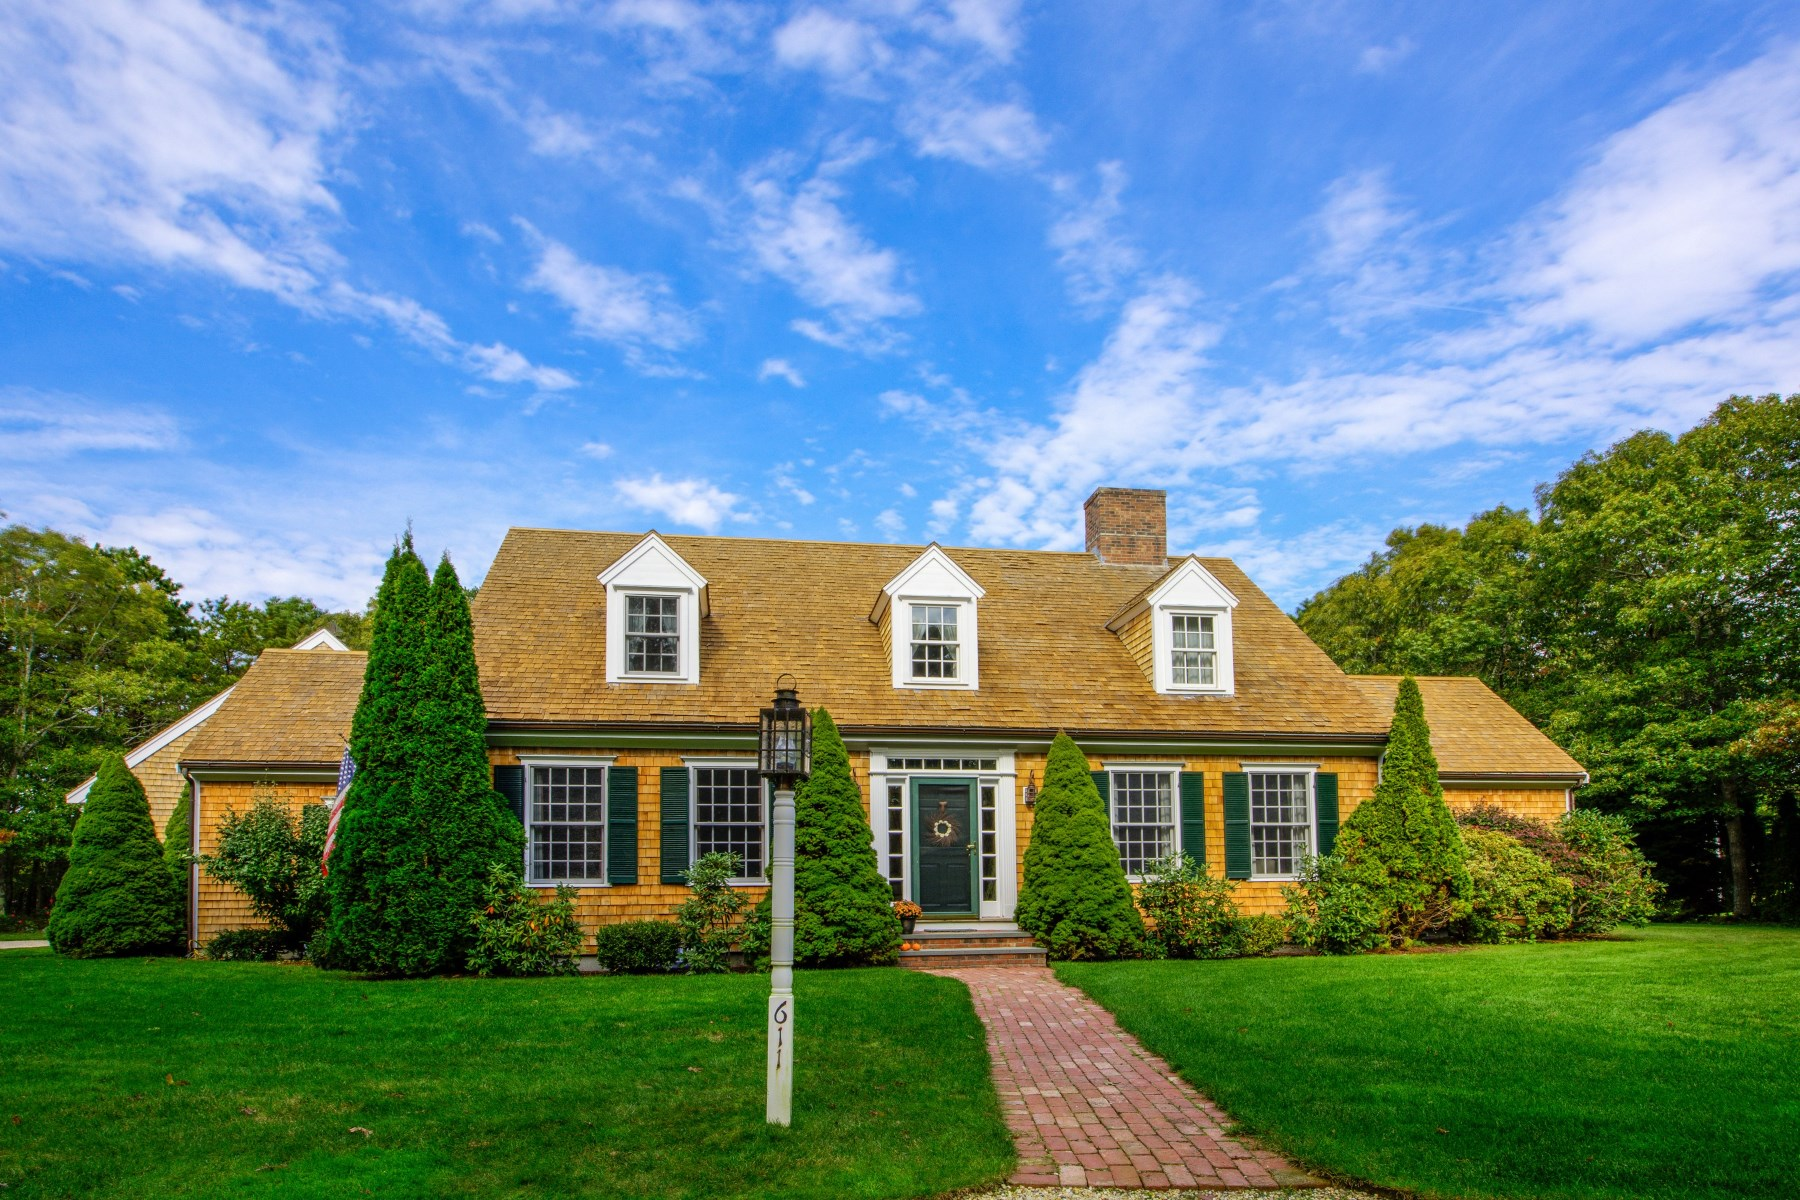 Casa Unifamiliar por un Venta en Charming Cape in Oyster Harbors 611 Grand Island Drive Osterville, Massachusetts, 02655 Estados Unidos